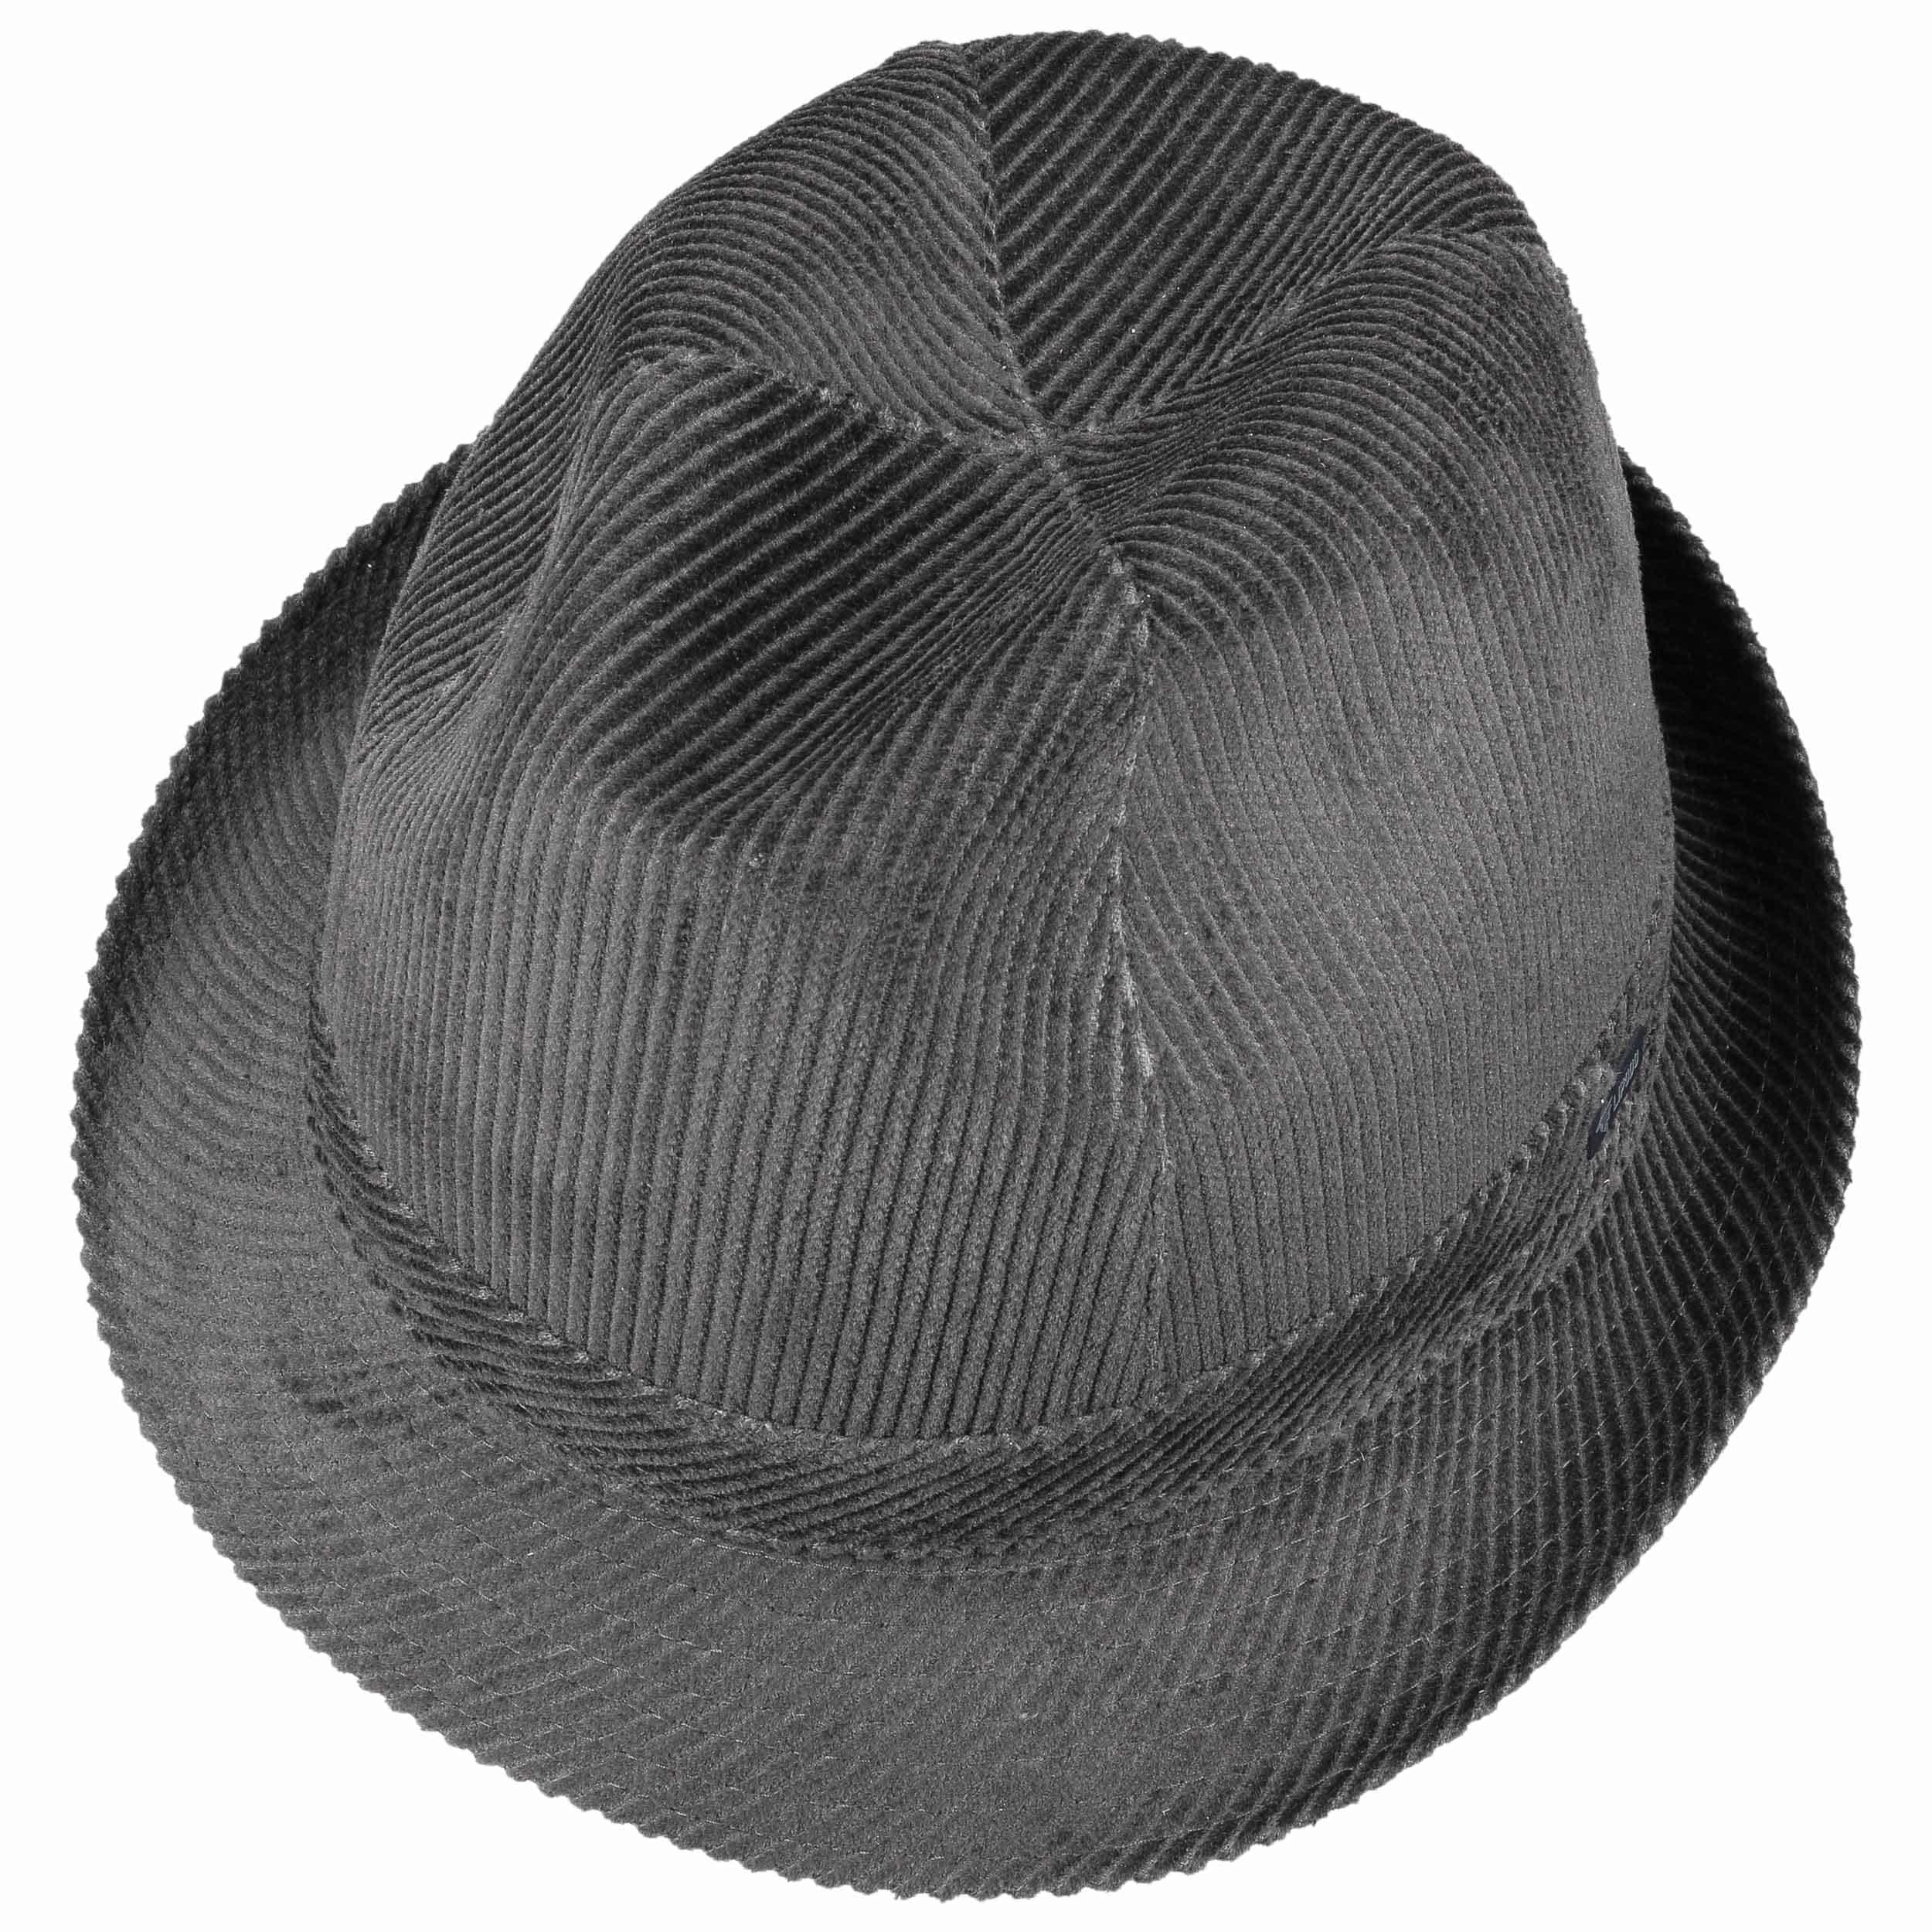 7af3a40a0a5 ... Molinar Corduroy Hat by Lipodo - olive 1 ...